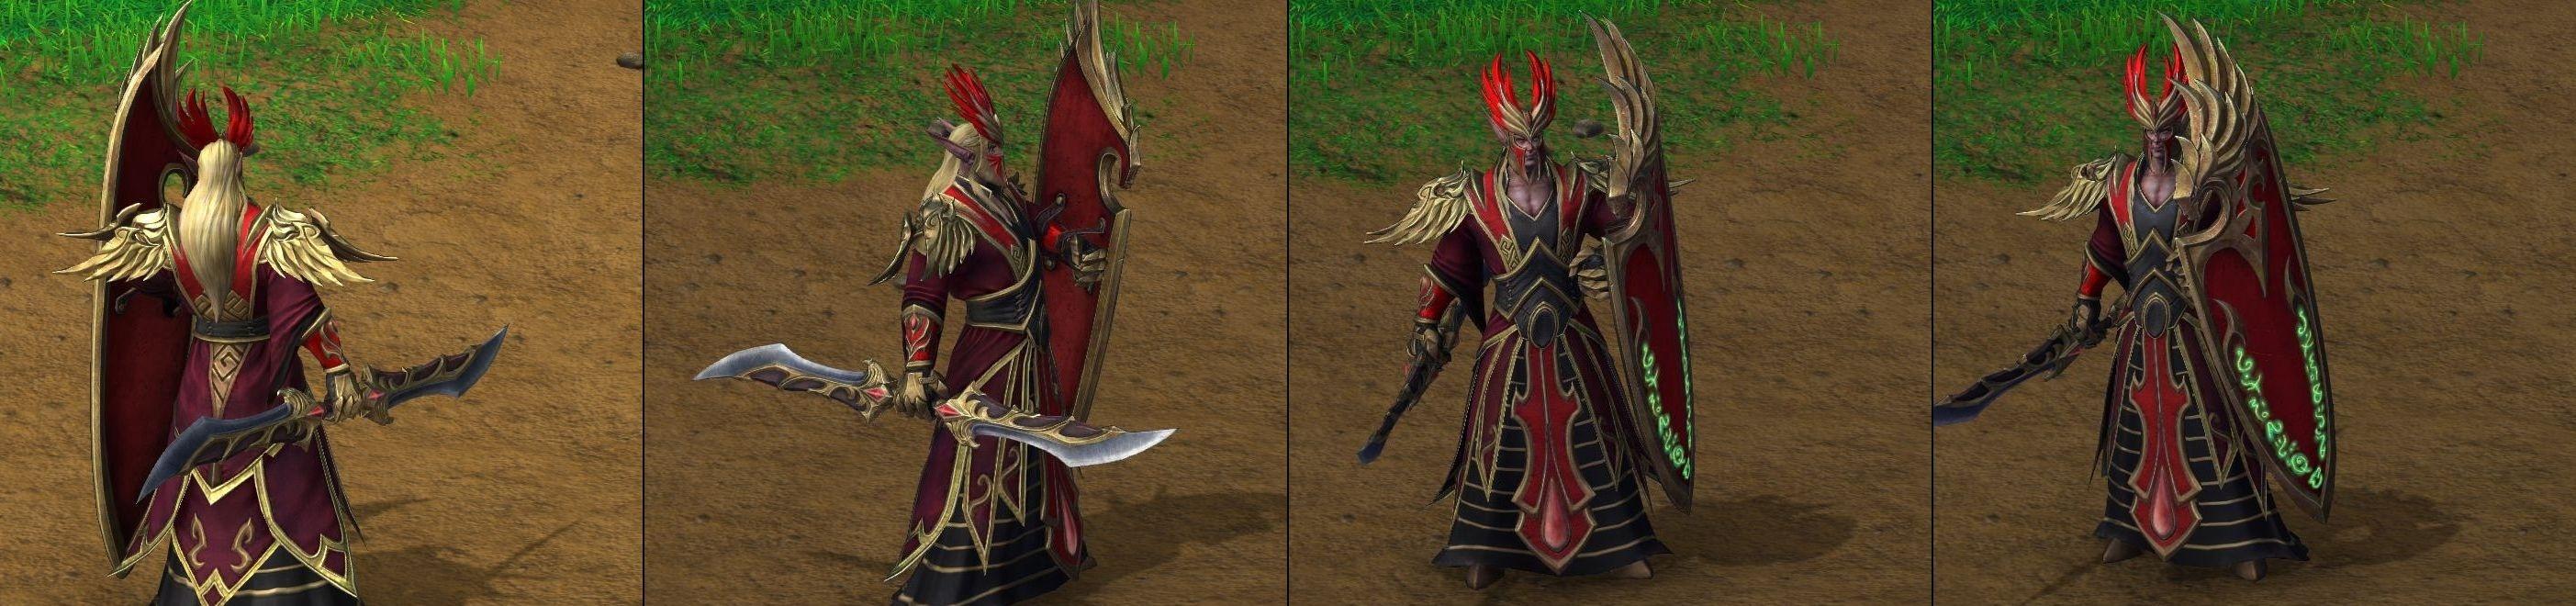 Warcraft Iii Reforged Beta Menu Screenshots Datamined Resetera